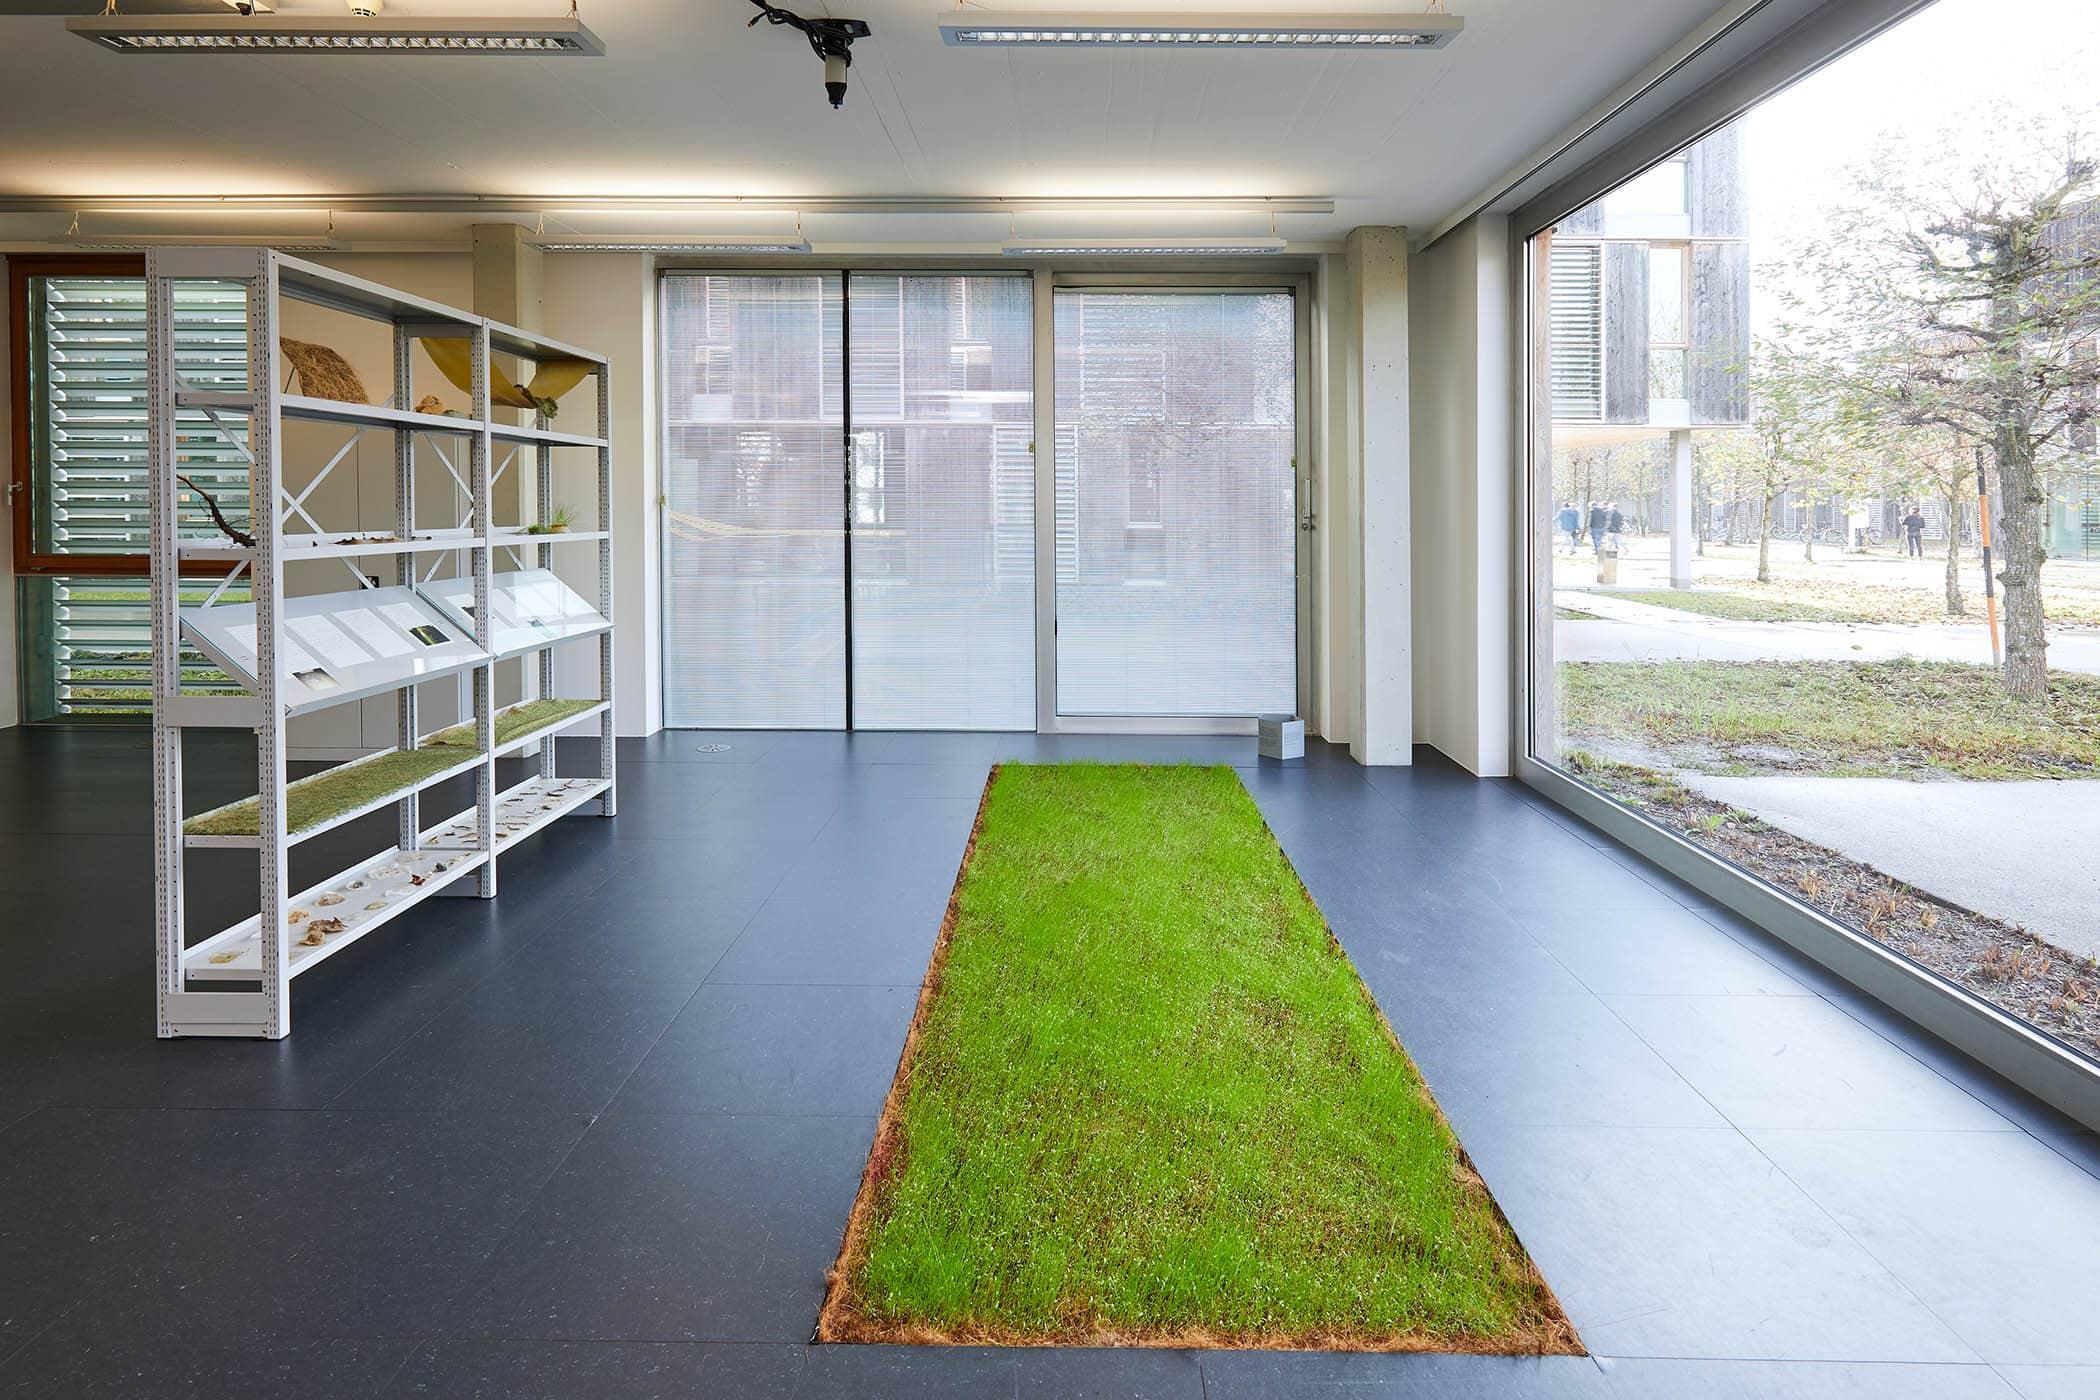 Kunstraum Lakeside - Hangar Barcelona (c) Johannes Puch